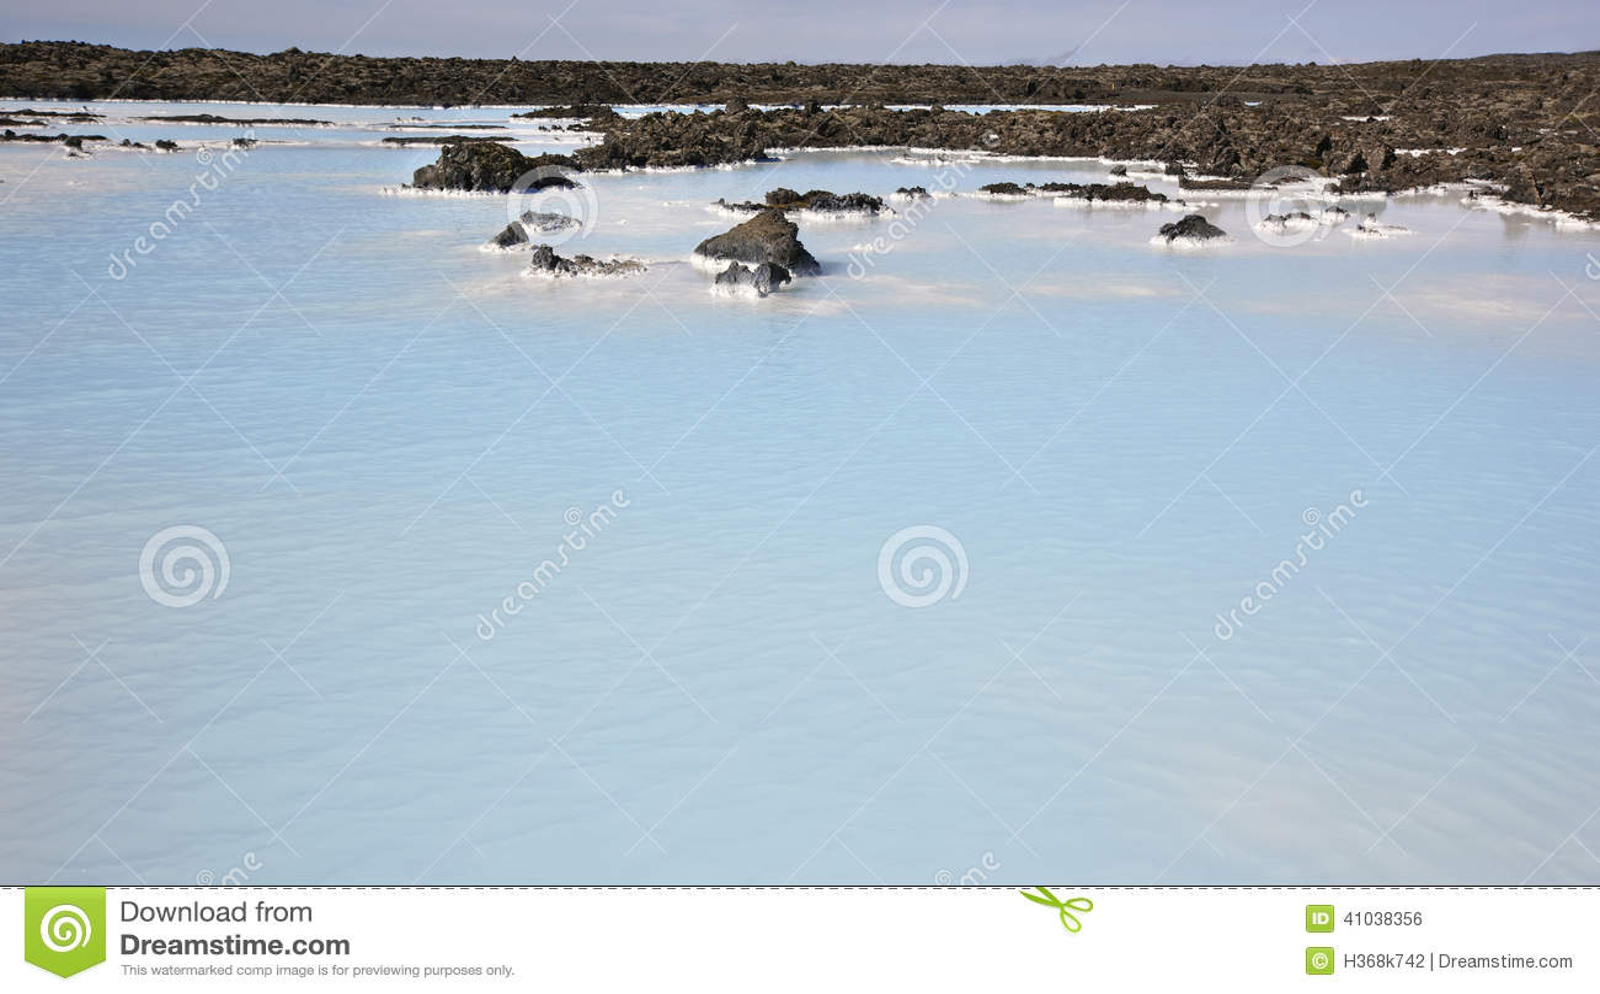 Islândia Península de Reykjanes Lagoa azul Termas geotérmicas grind